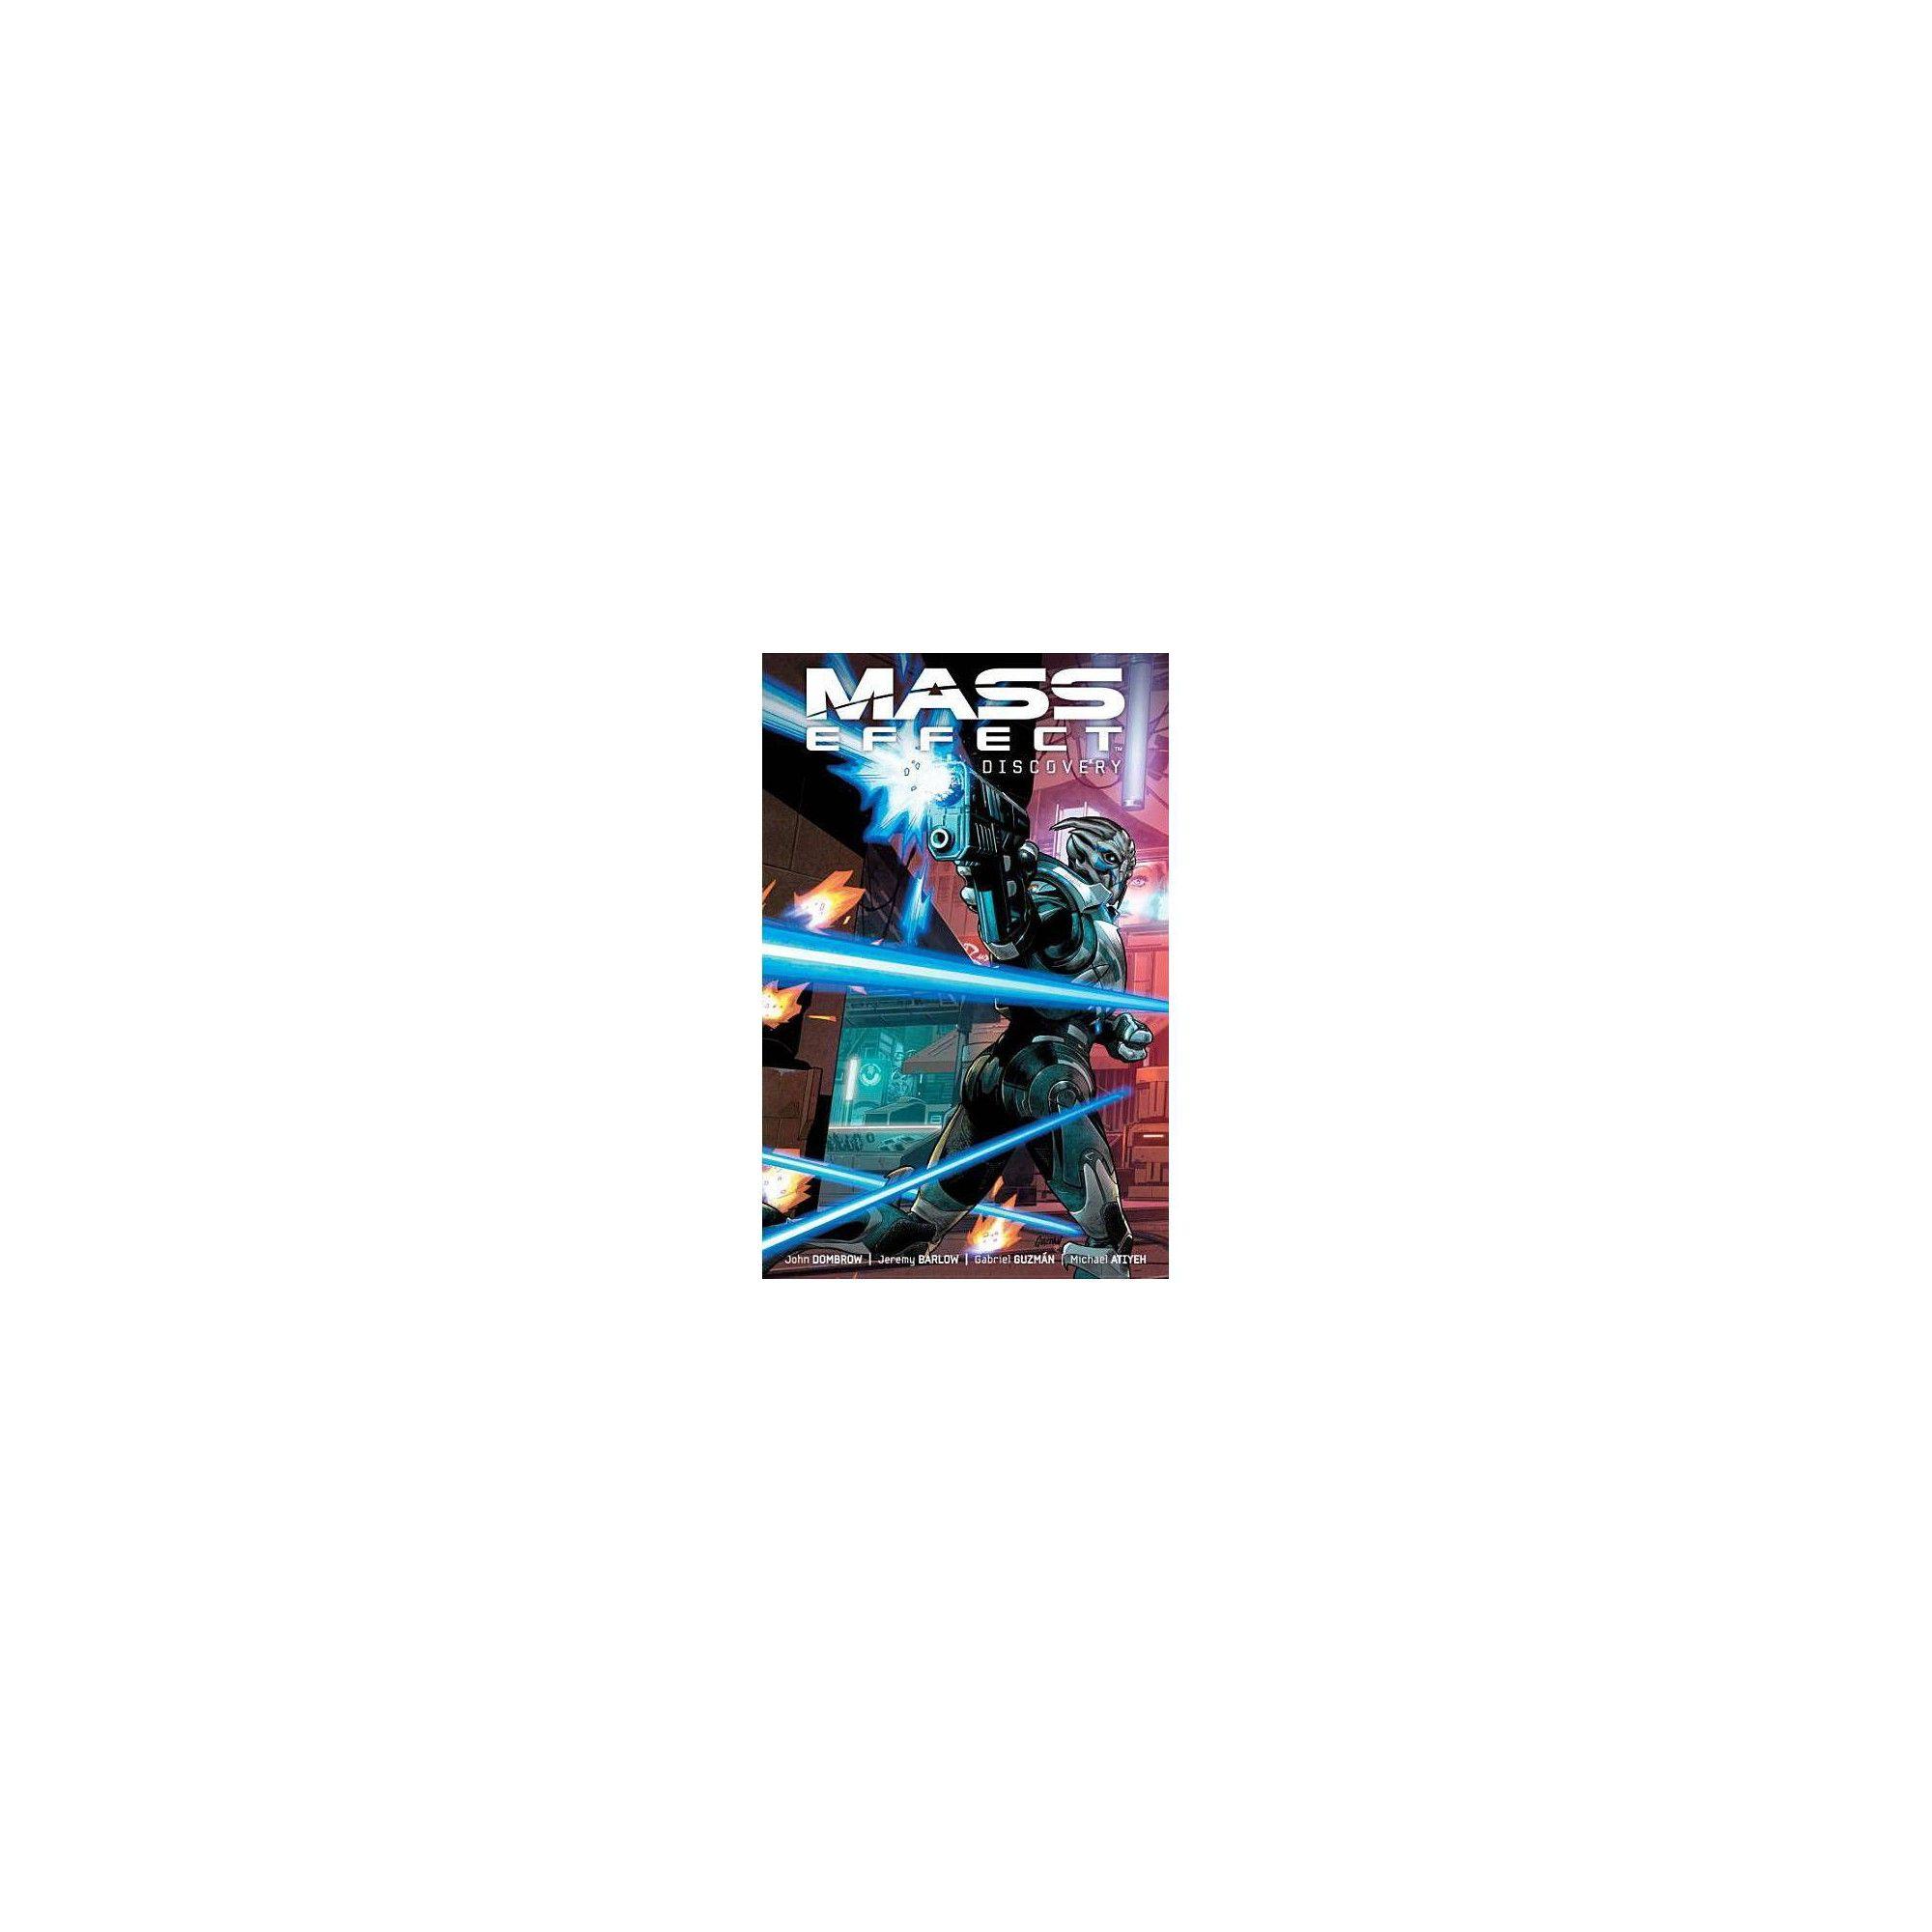 Mass Effect Discovery by Bioware & Jeremy Barlow